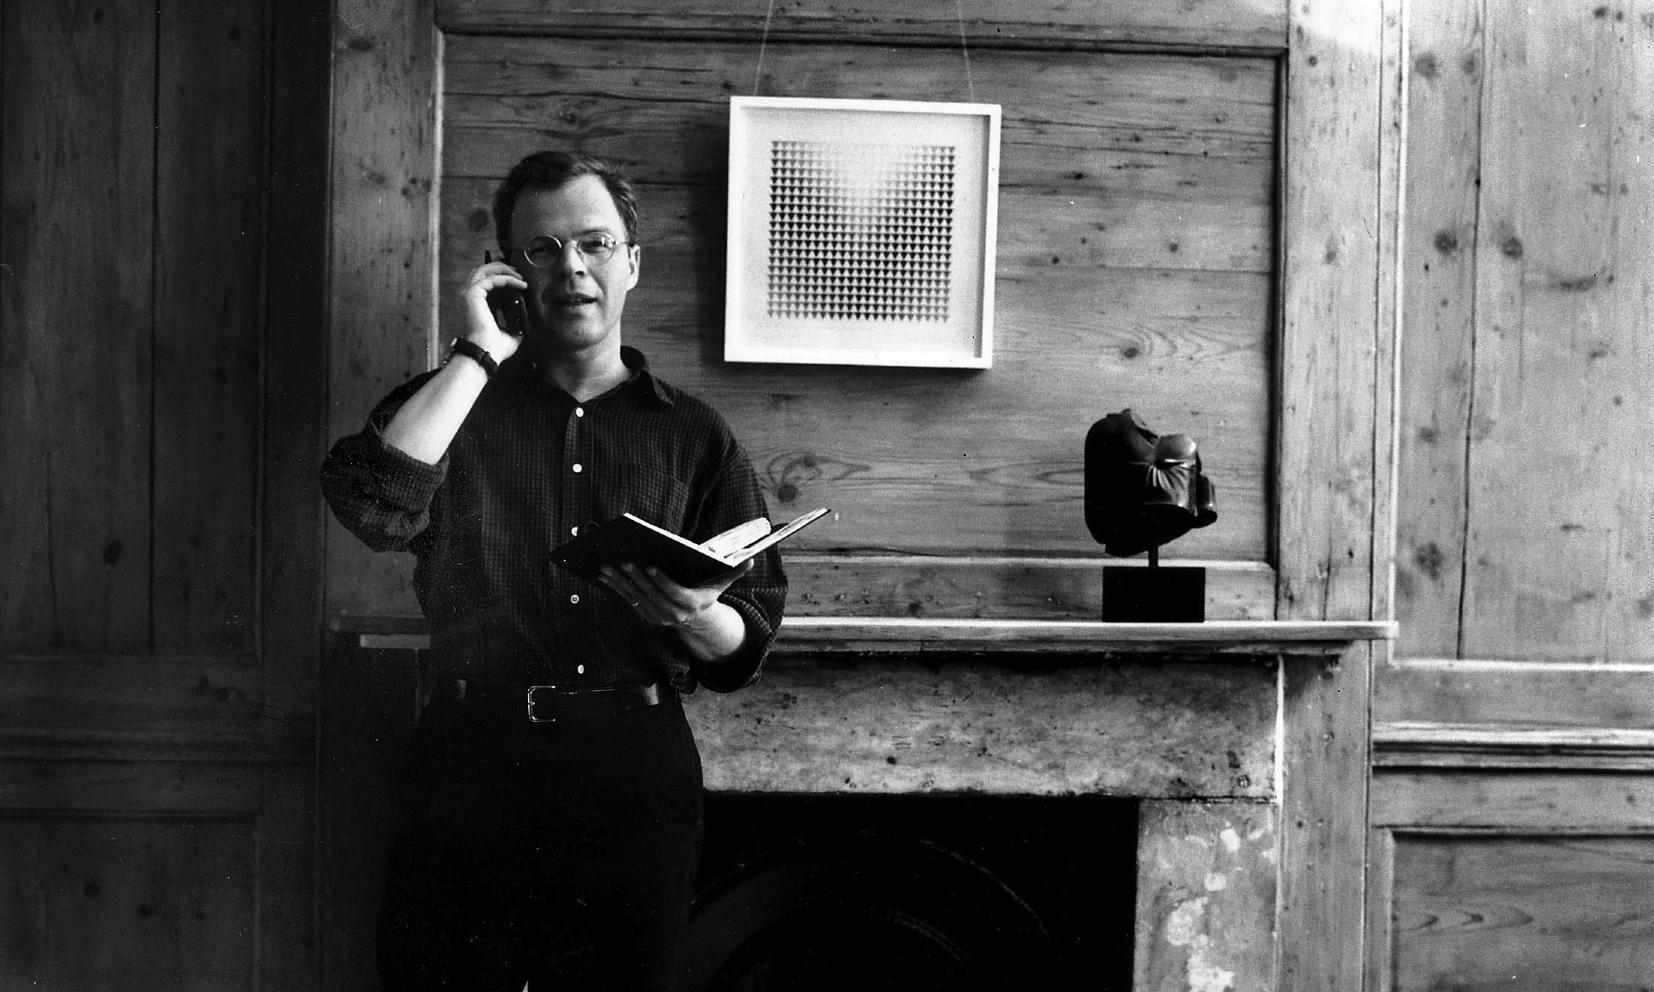 Karsten Schubert obituary